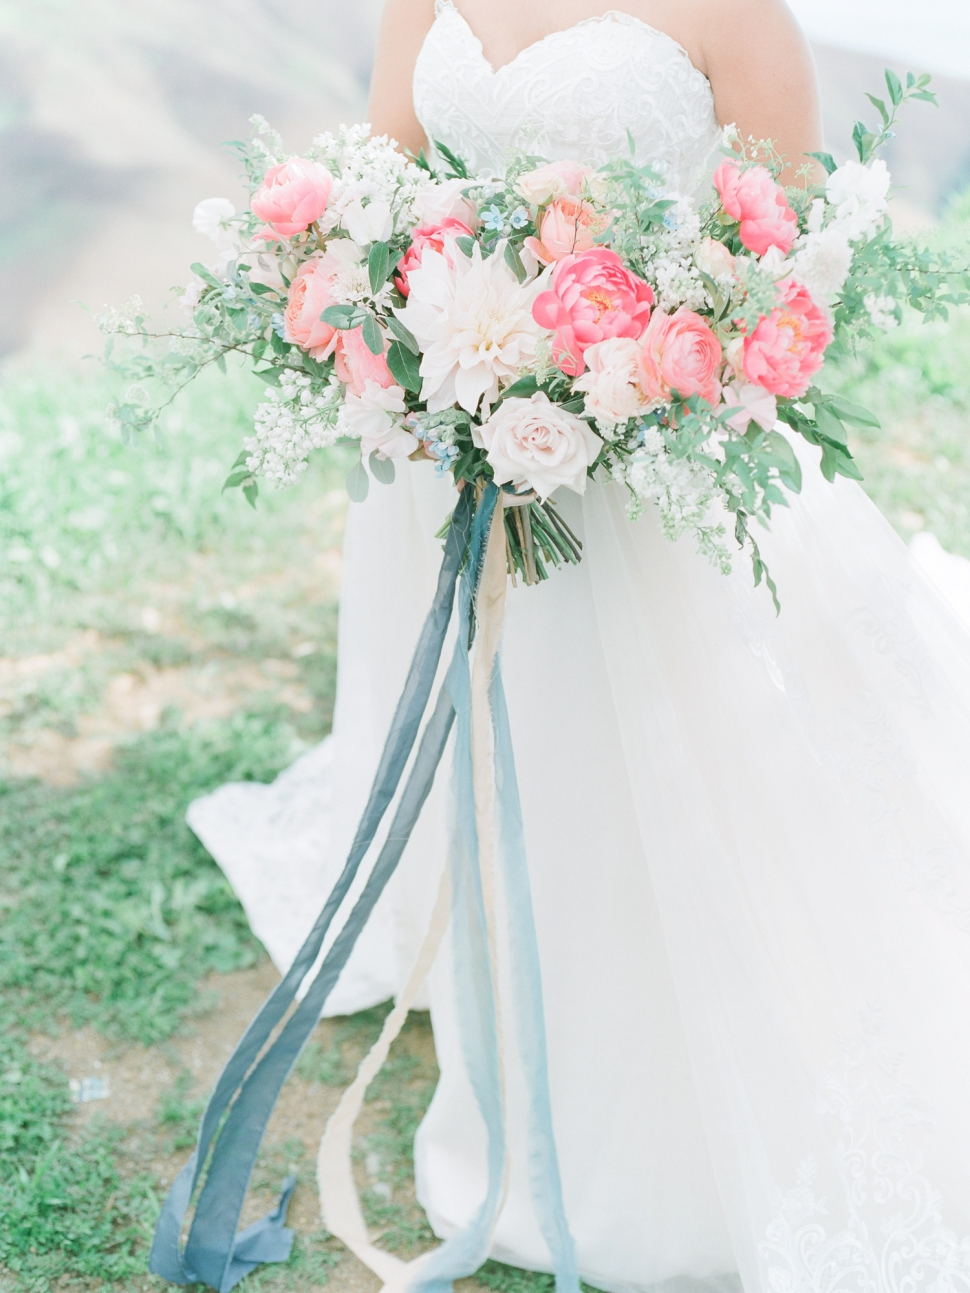 Southern-California-Malibu-Wedding-Photographer-Cassi-Claire-Deer-Creek-Ridge-Wedding_07.jpg